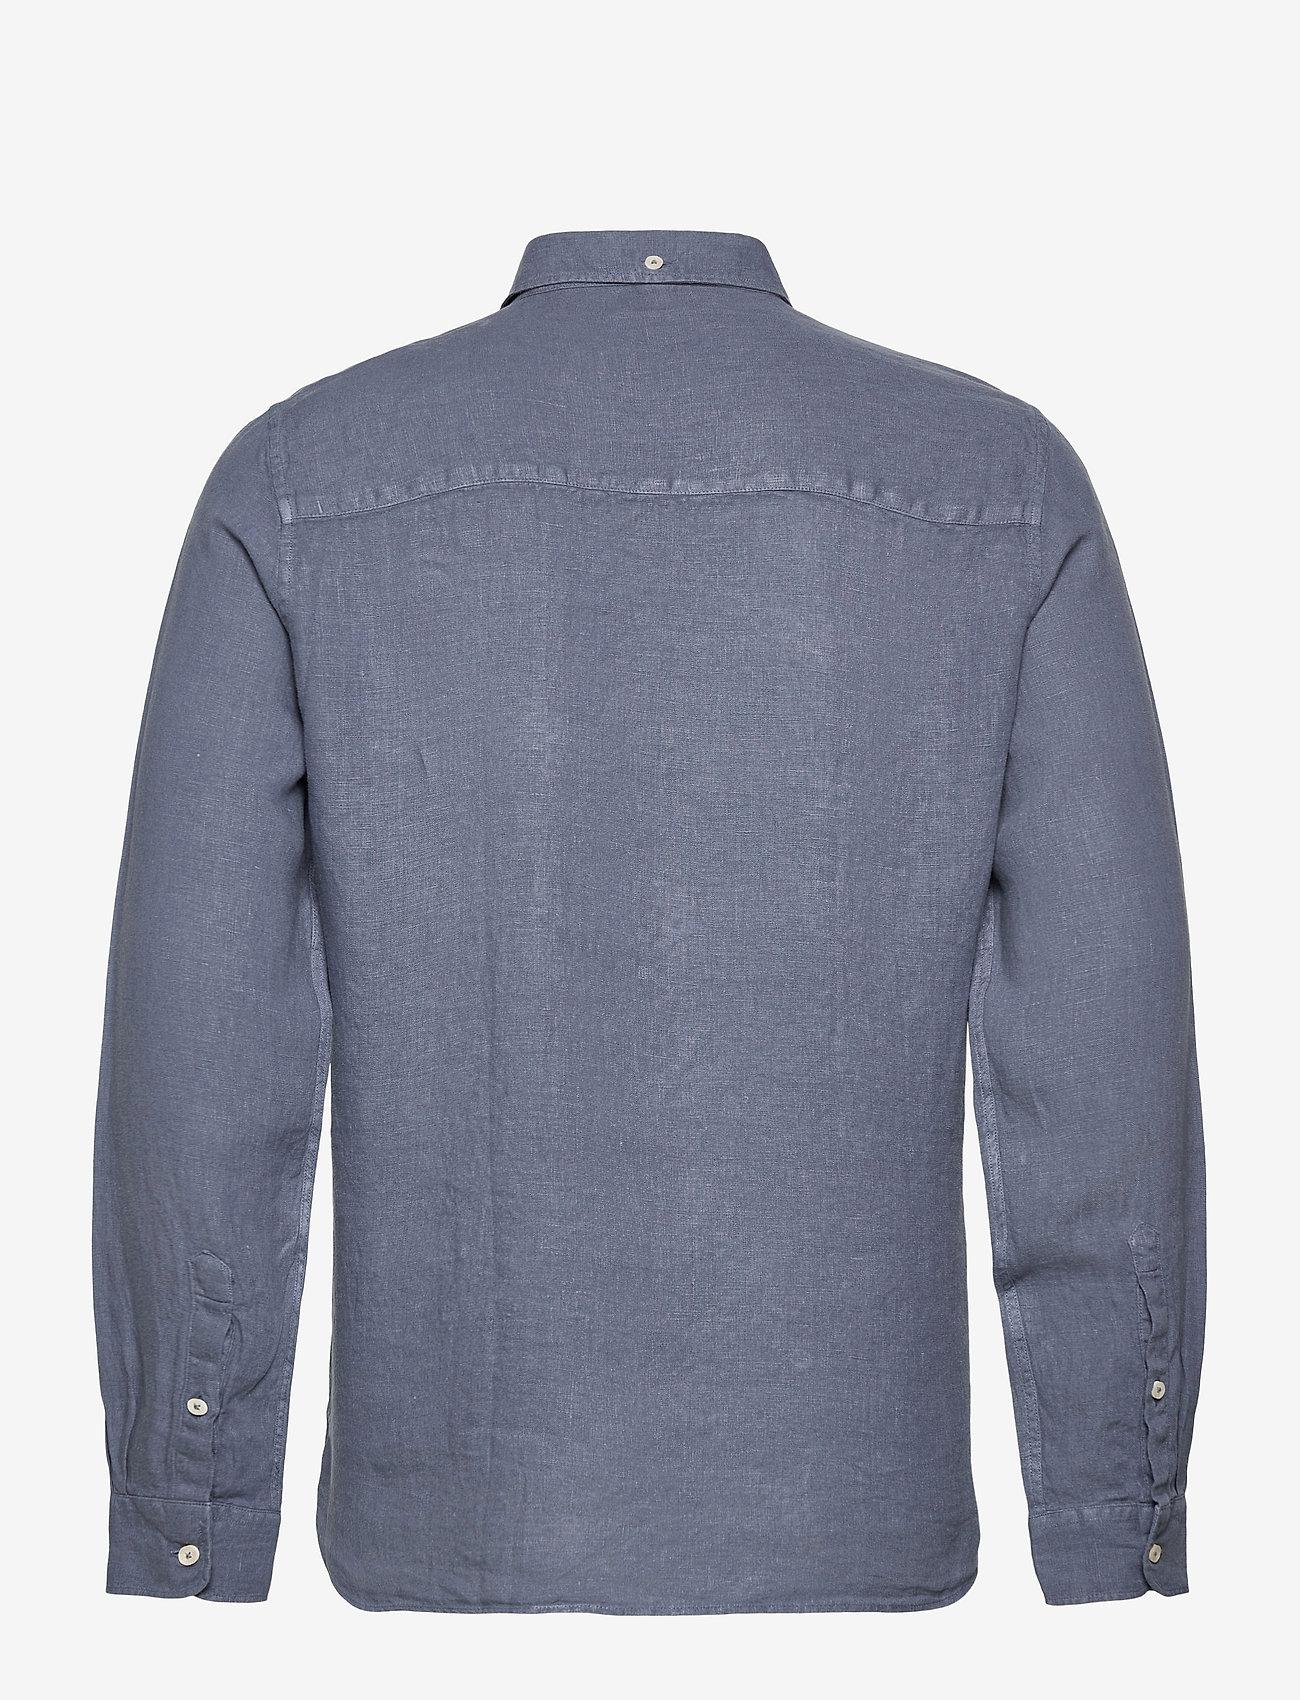 ECOALF - MALIBU SHIRT MAN - chemises à carreaux - grey blue - 1